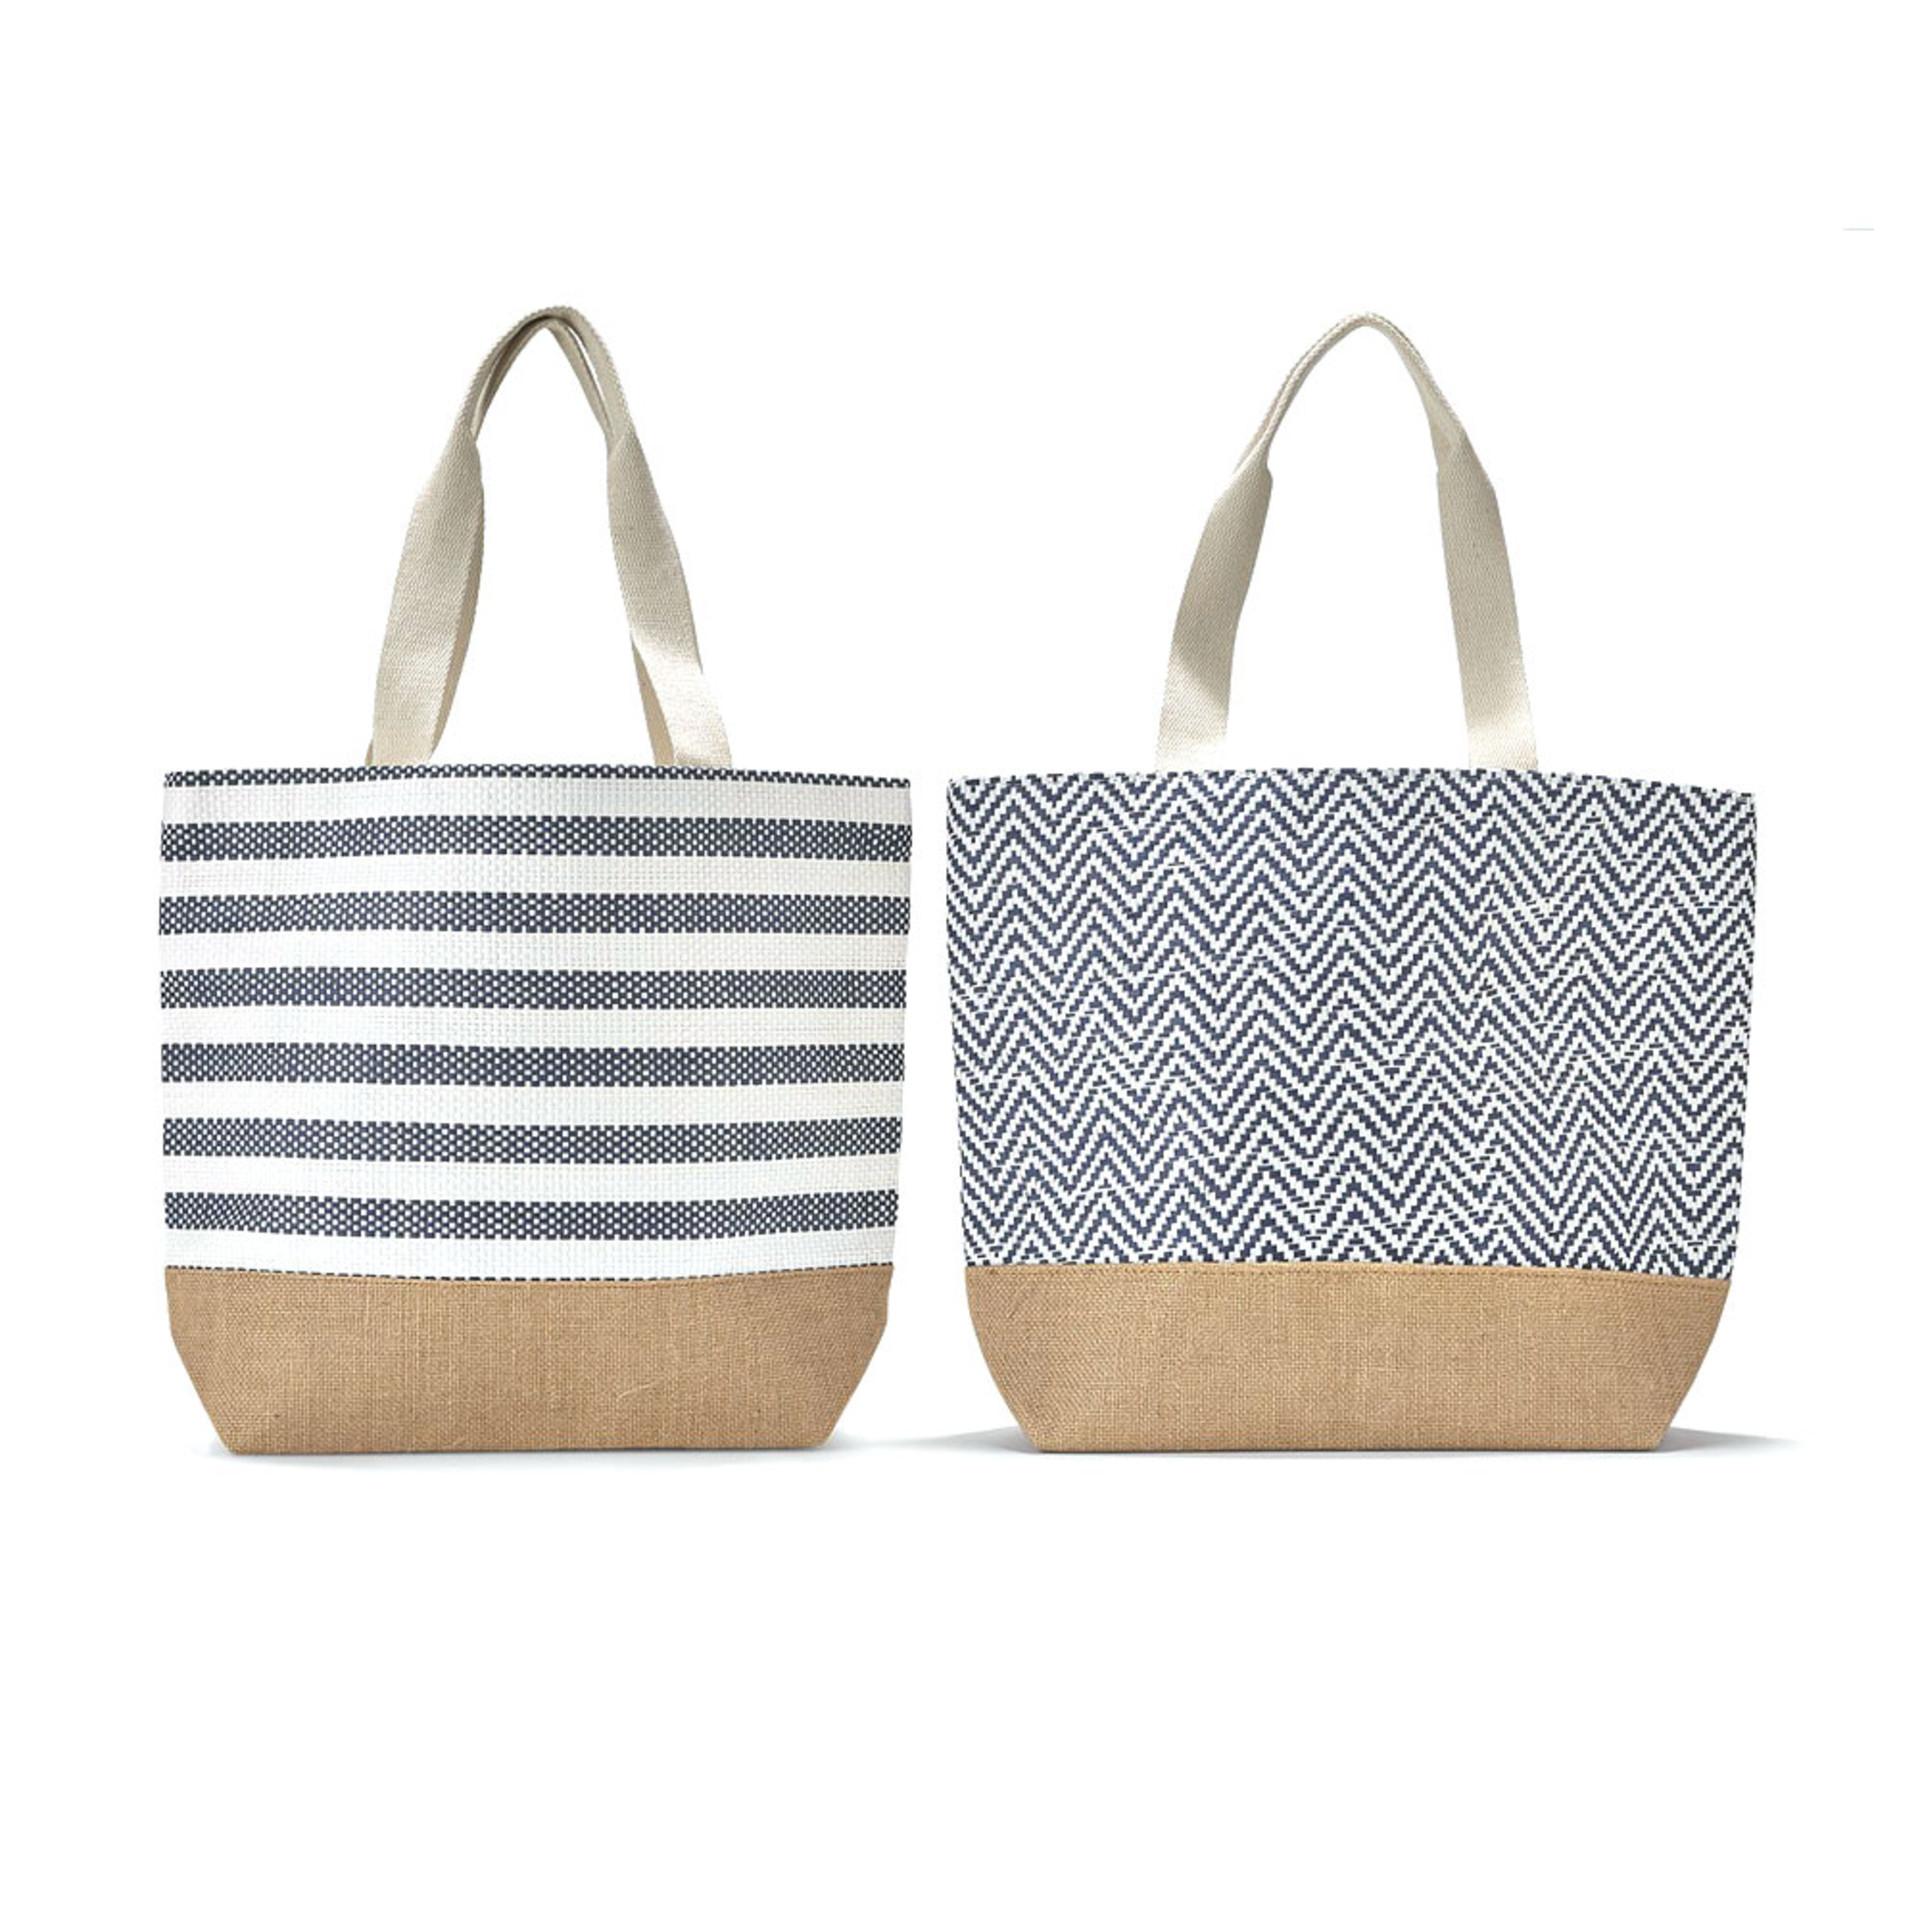 Two's Company Mykonos Tote Bag